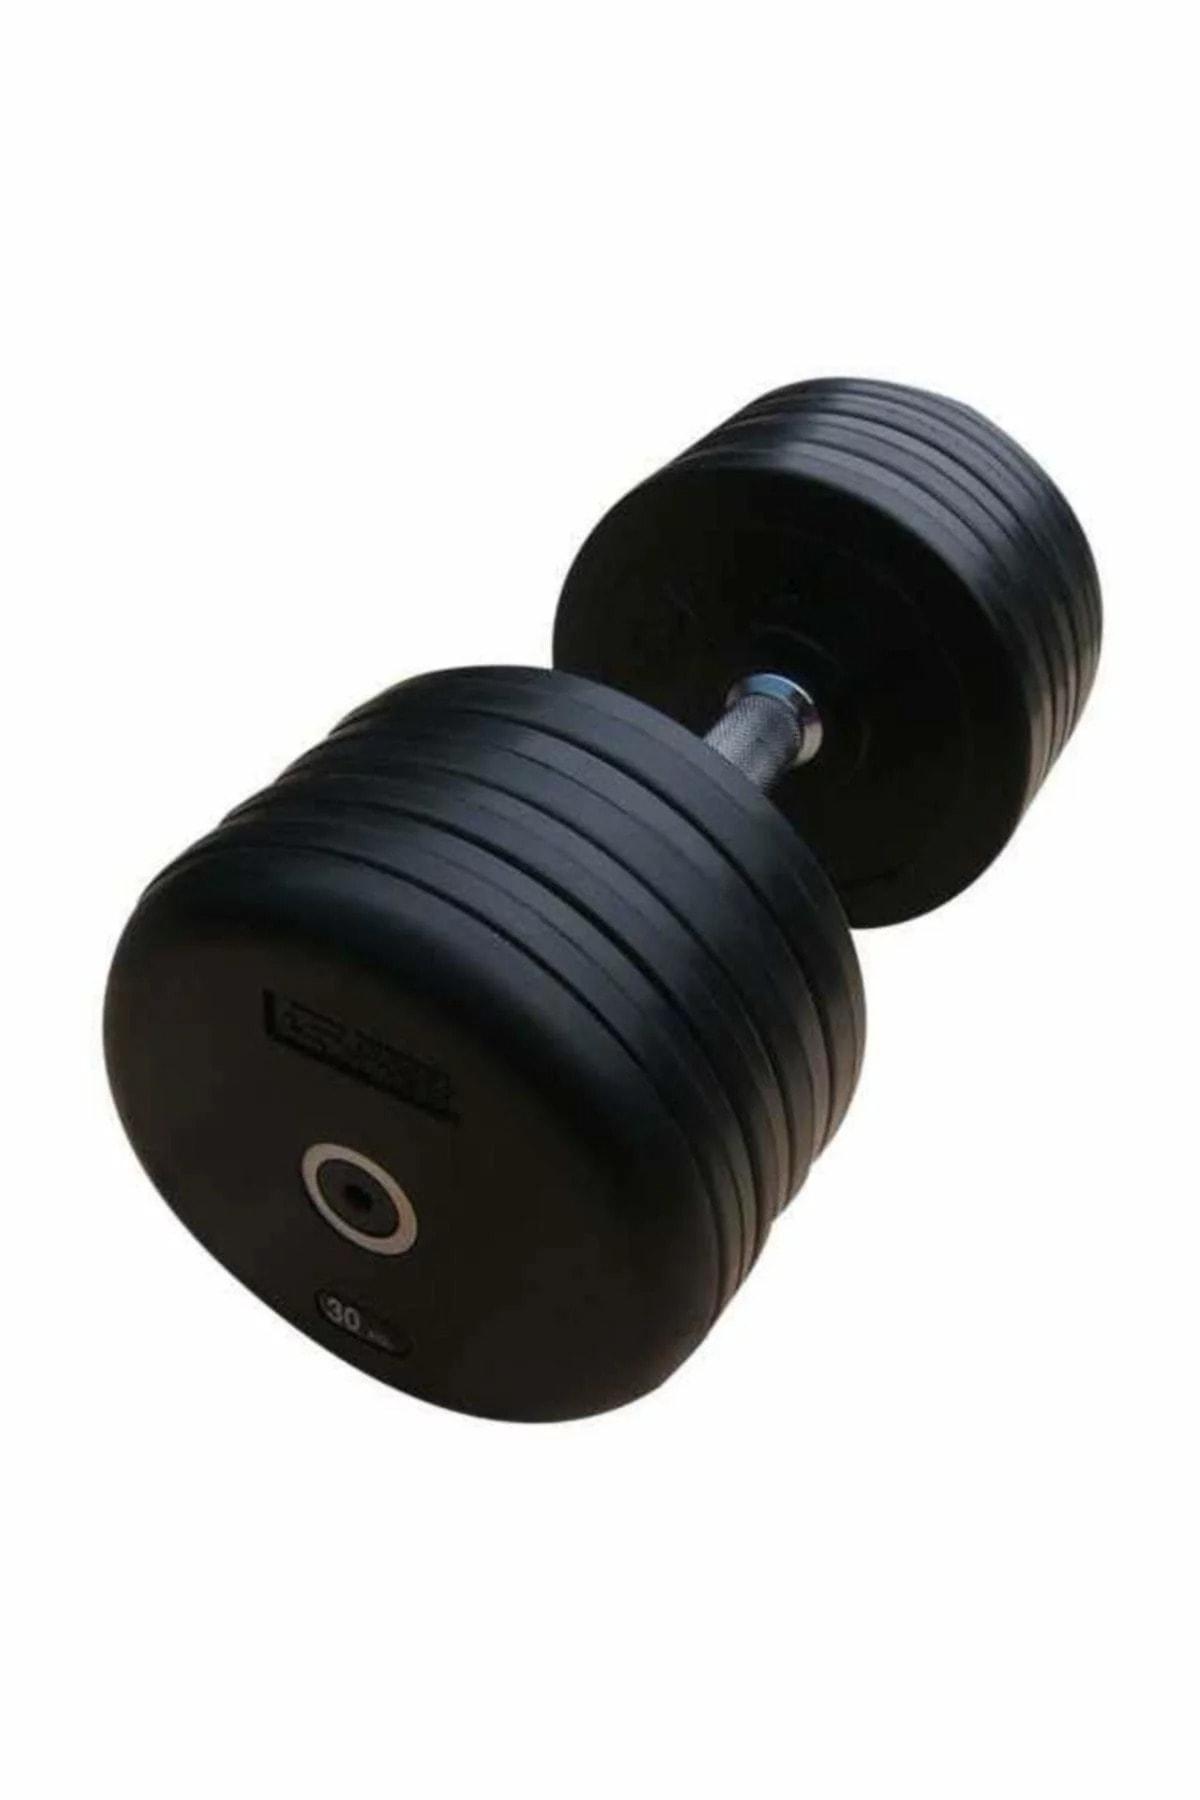 Diesel Fitness PSD-5 Kauçuk Dambıl 45 kg. 1